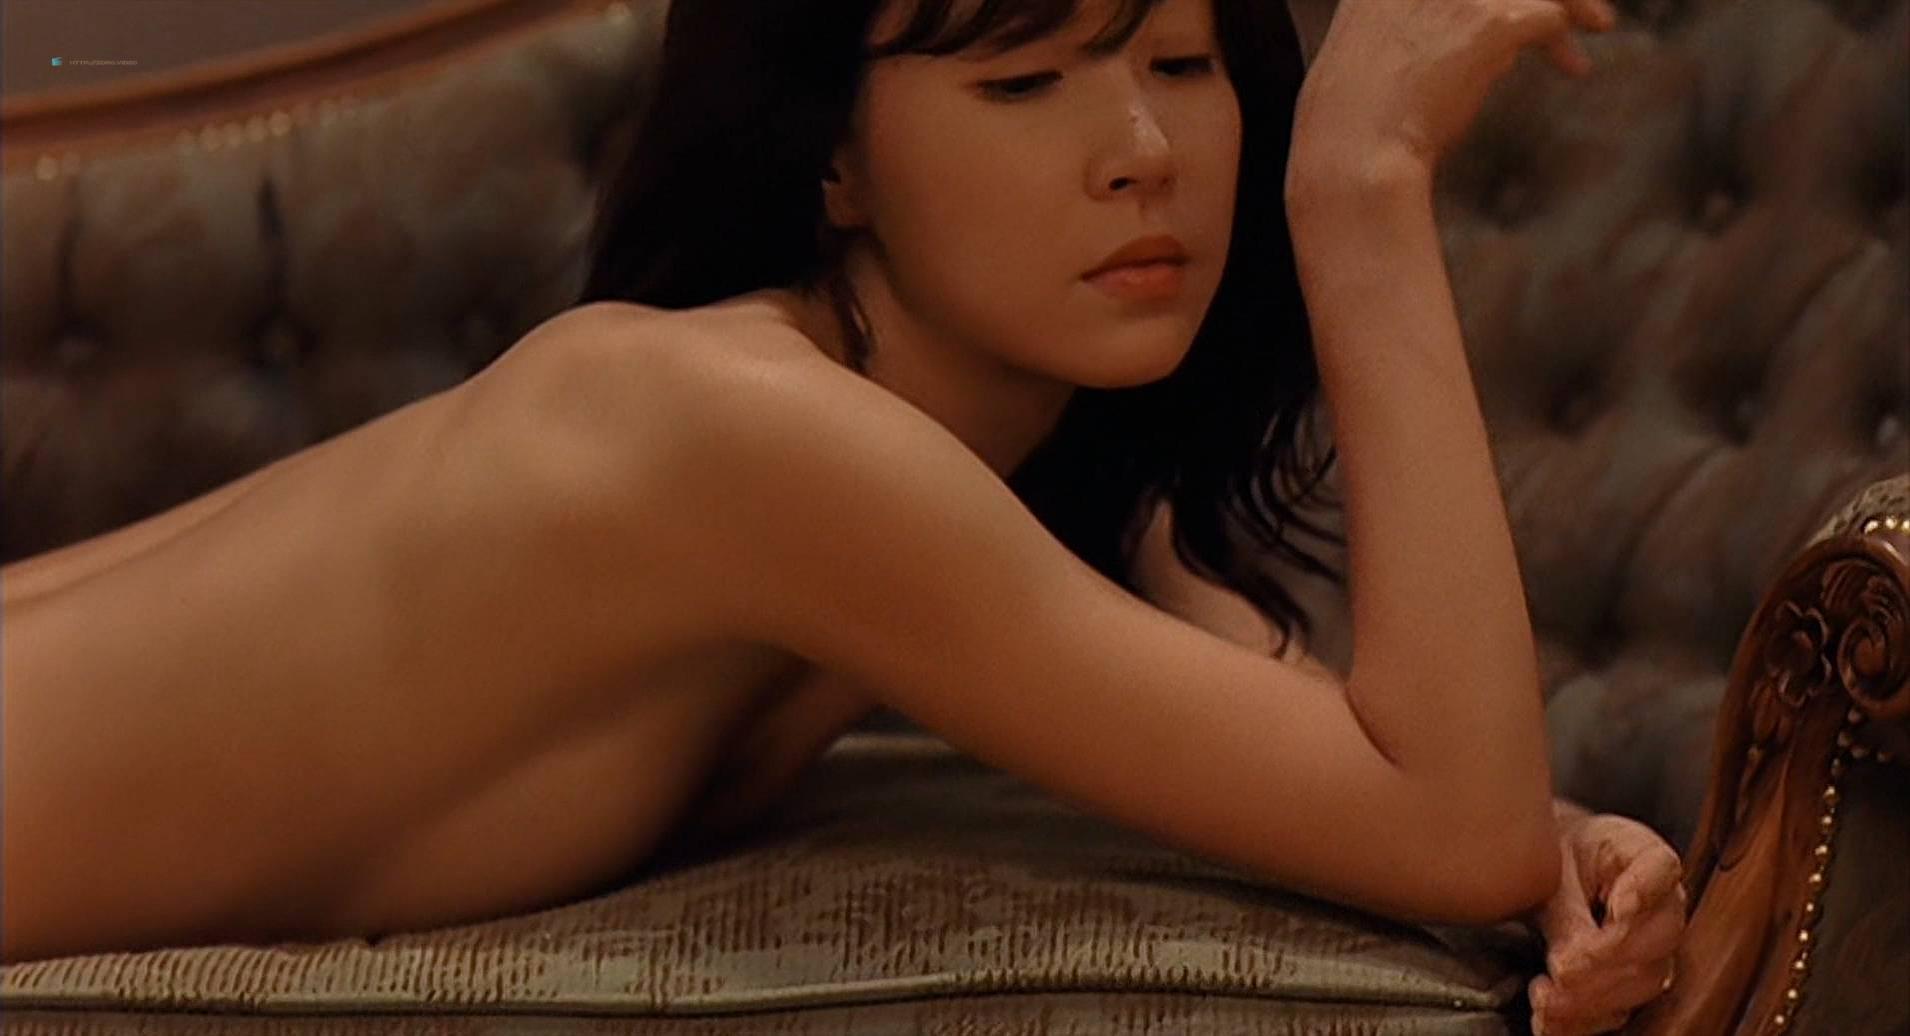 Ariana grande naked sucking